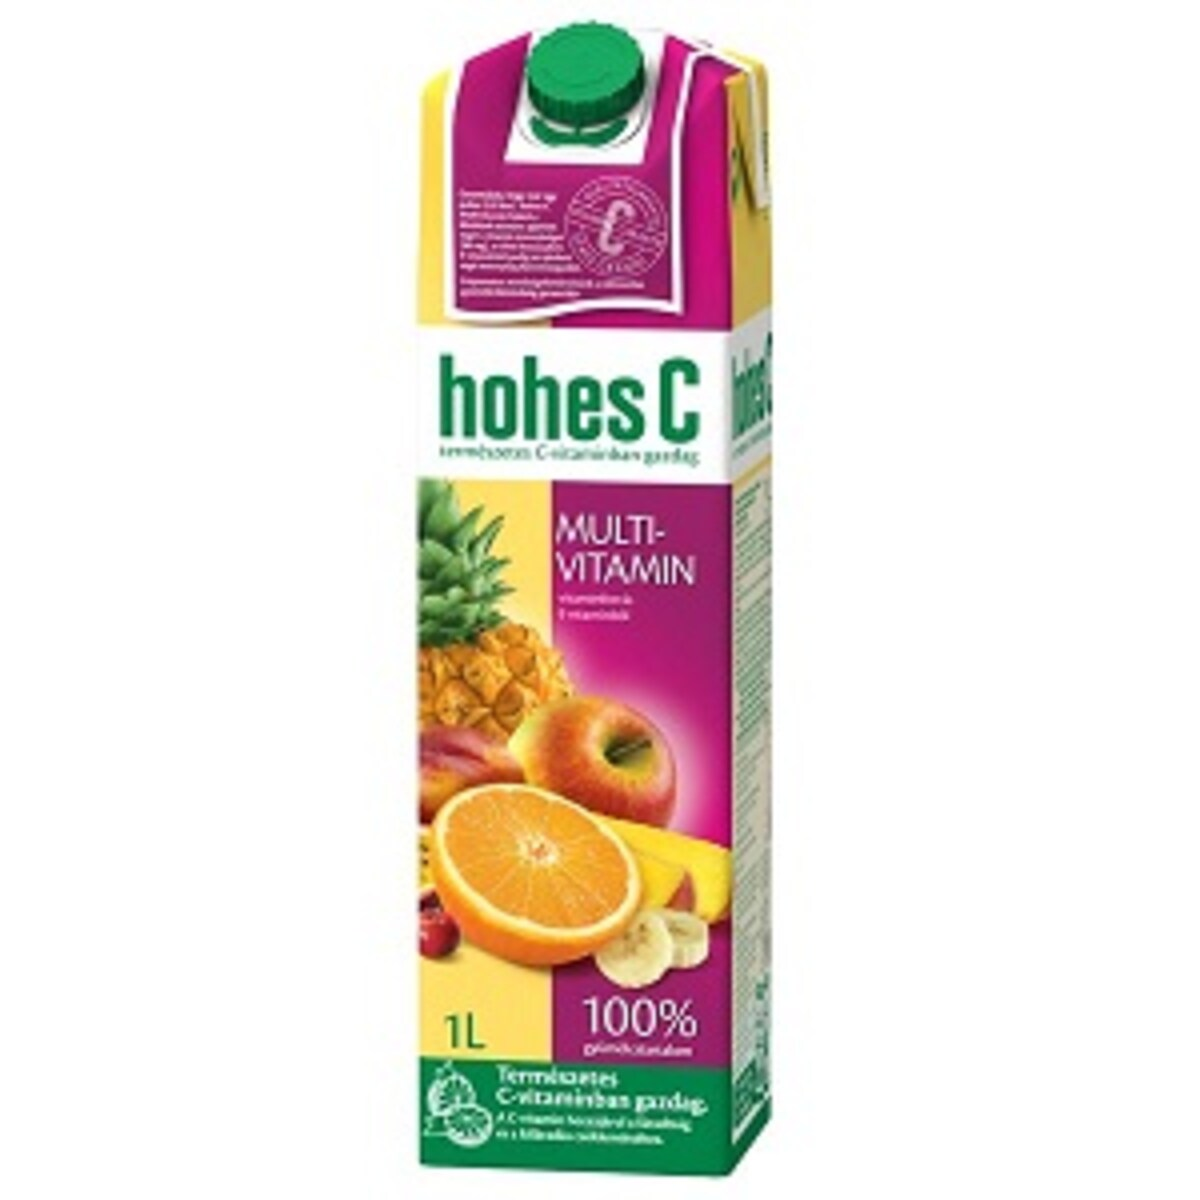 Hohes C Мултивитамин 100% плодов микс